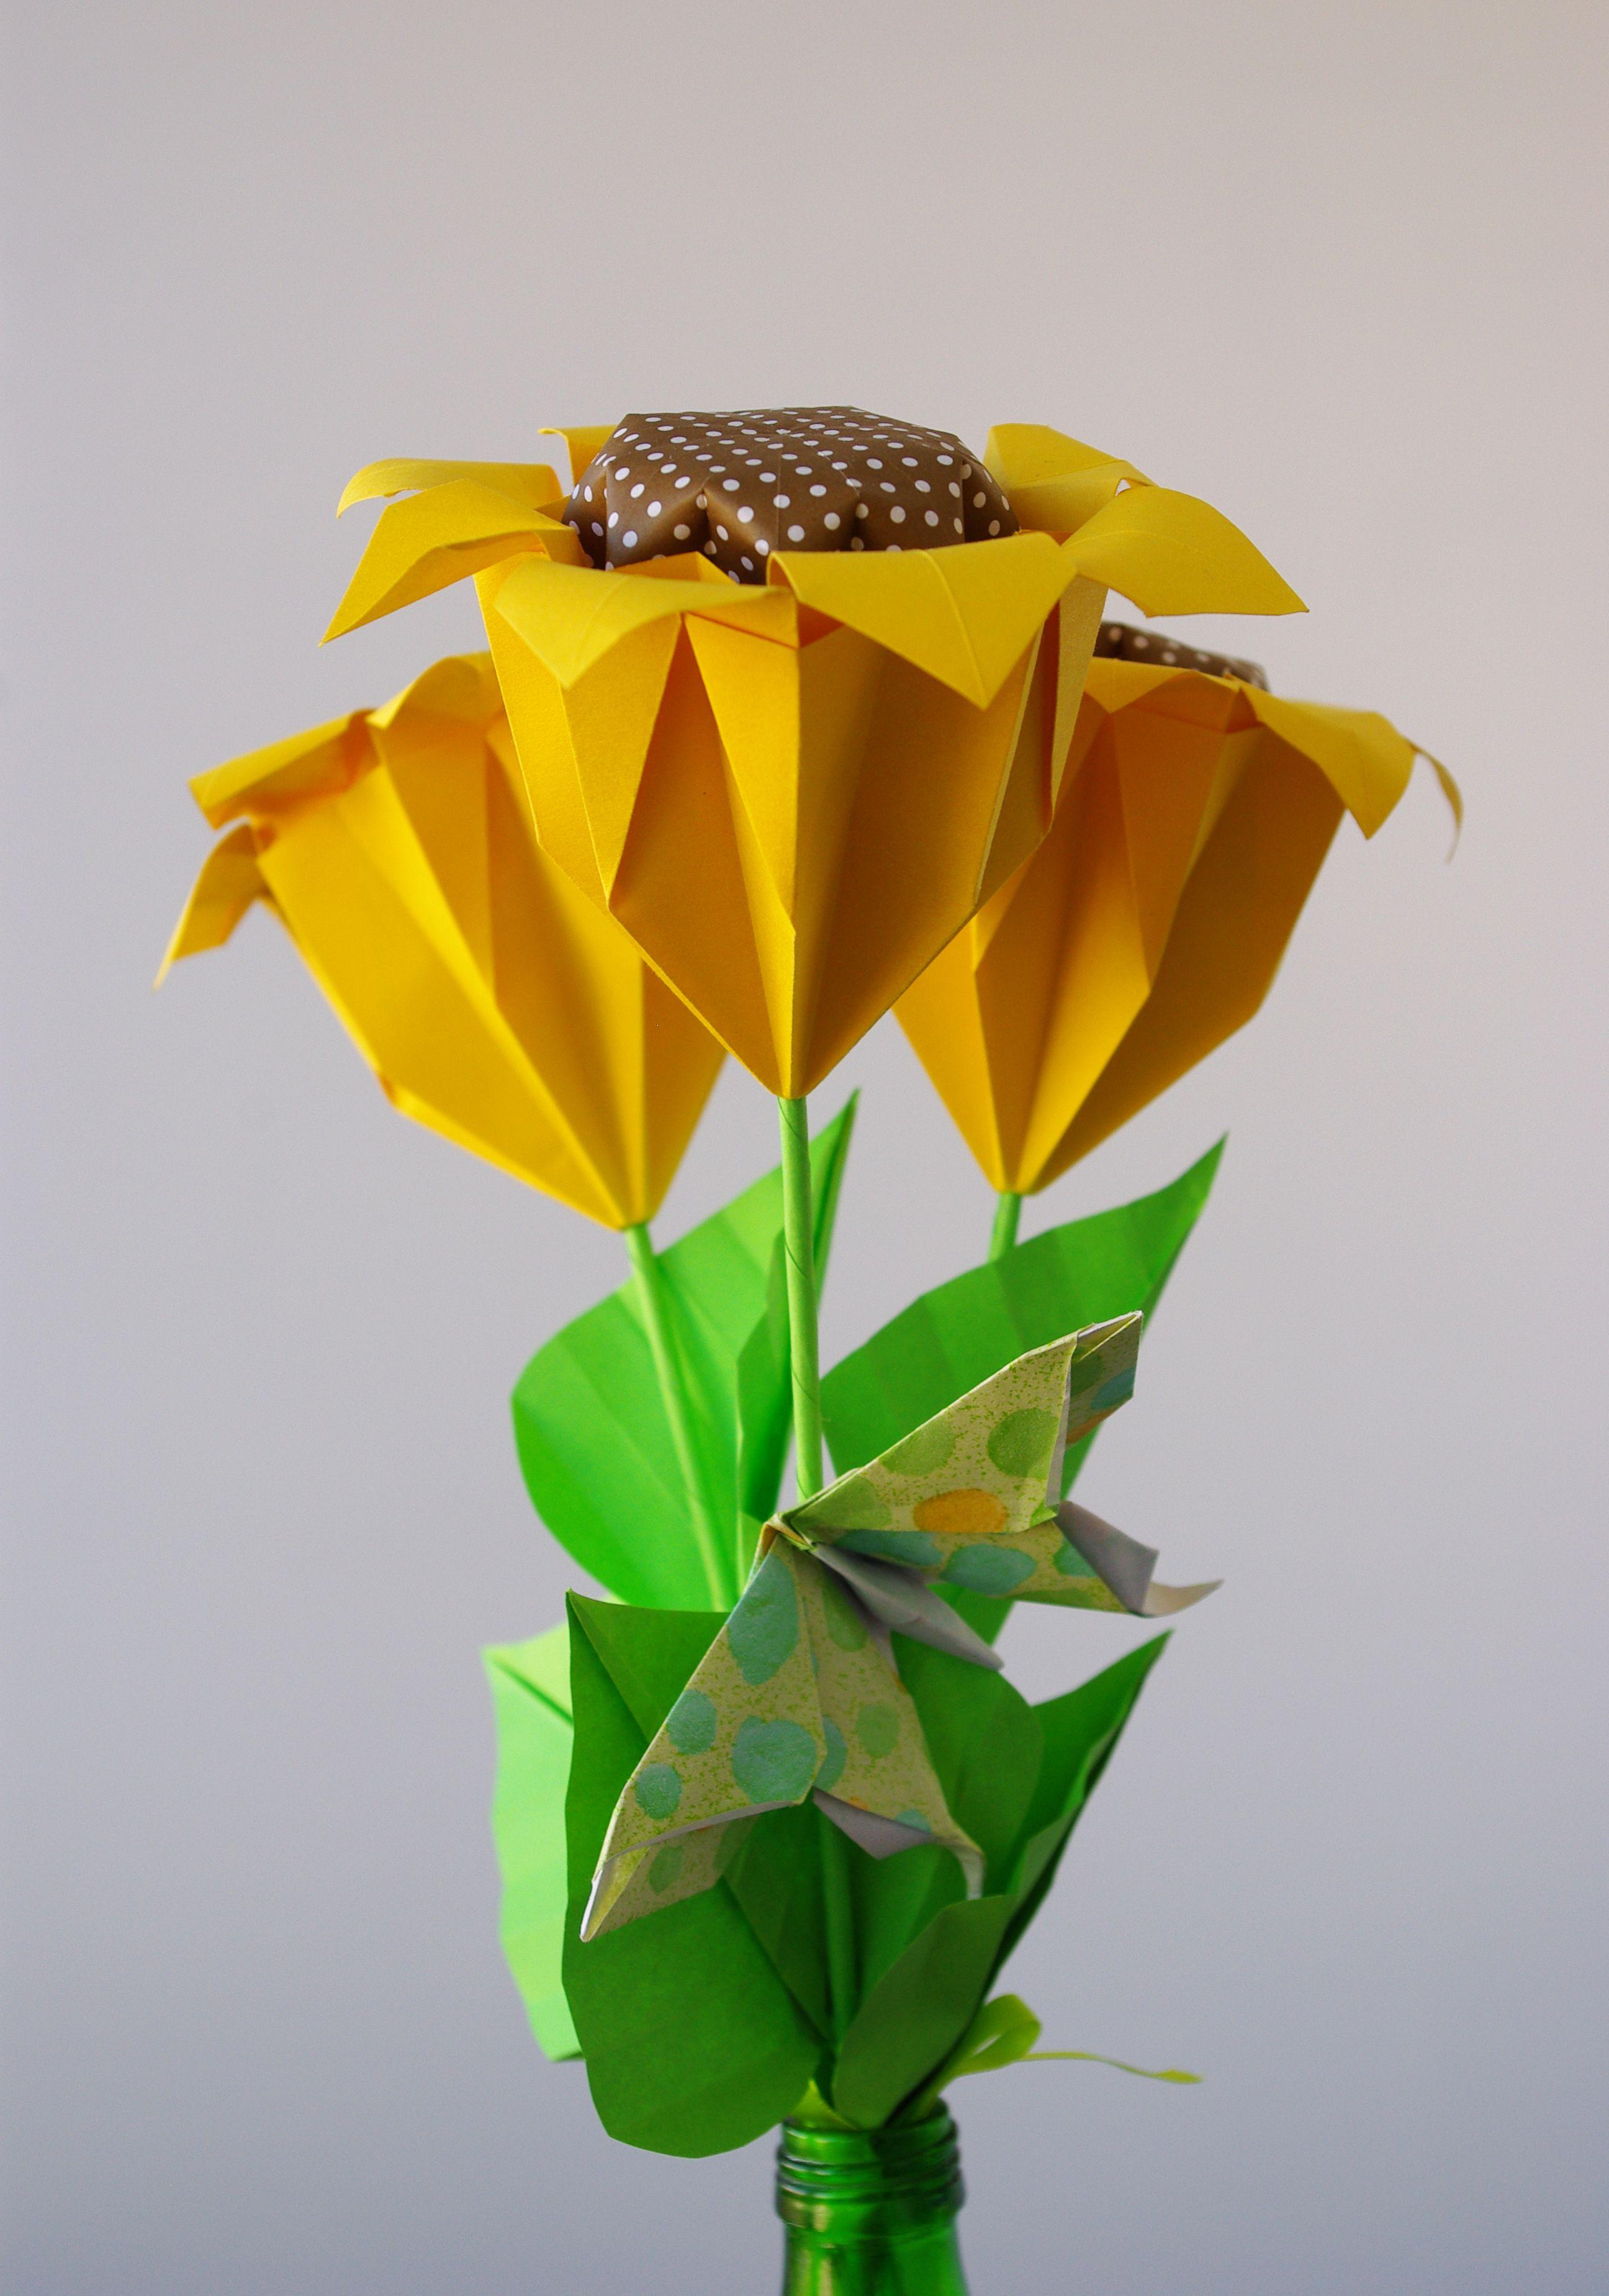 Sunflowers For My Mum Paper Folding Pinterest Sunflowers